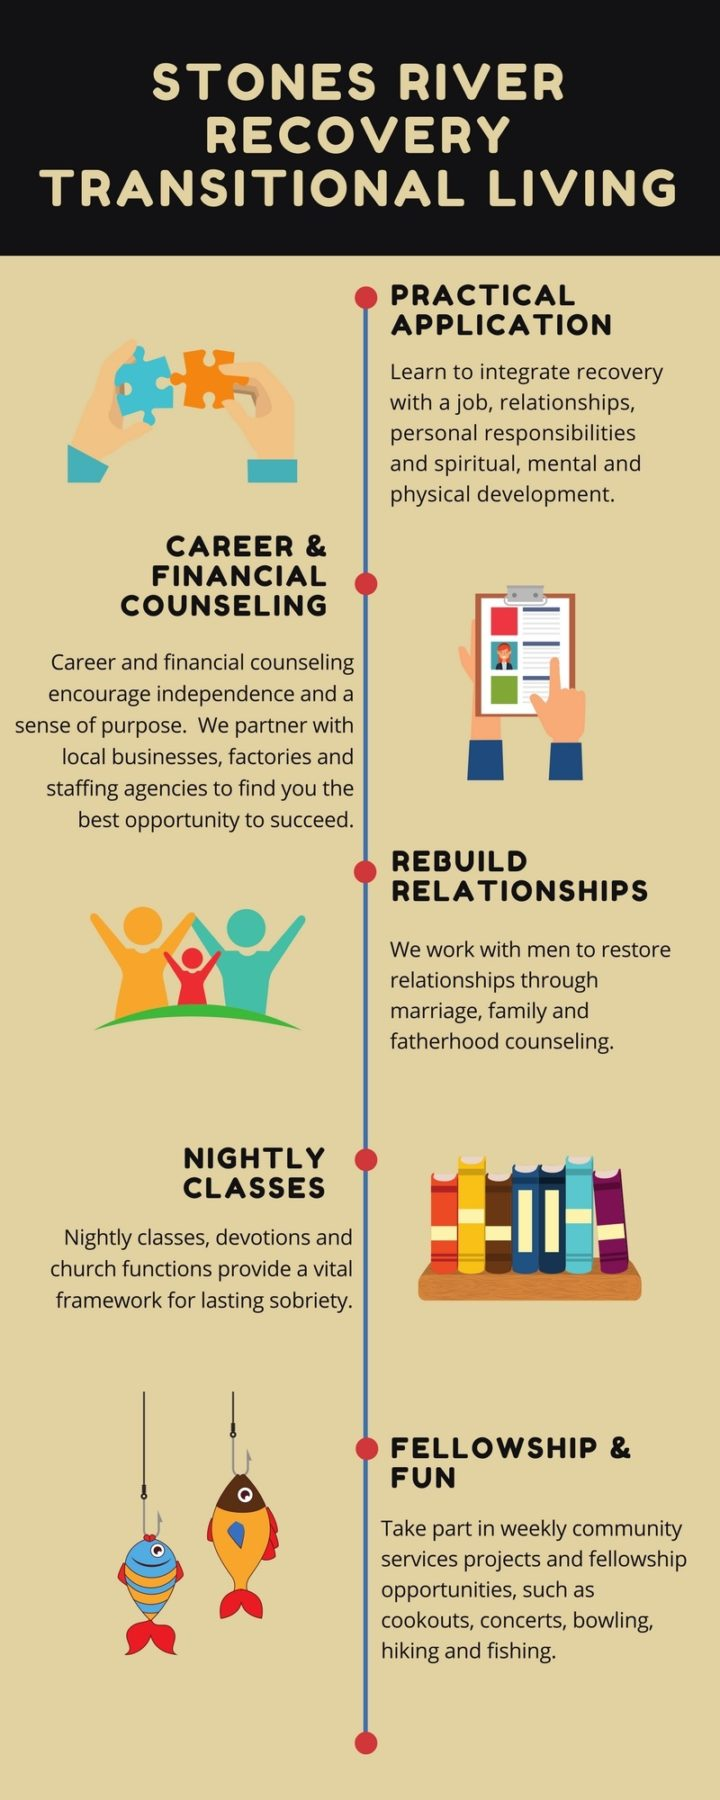 Transitional Living Infographic TN Nashville